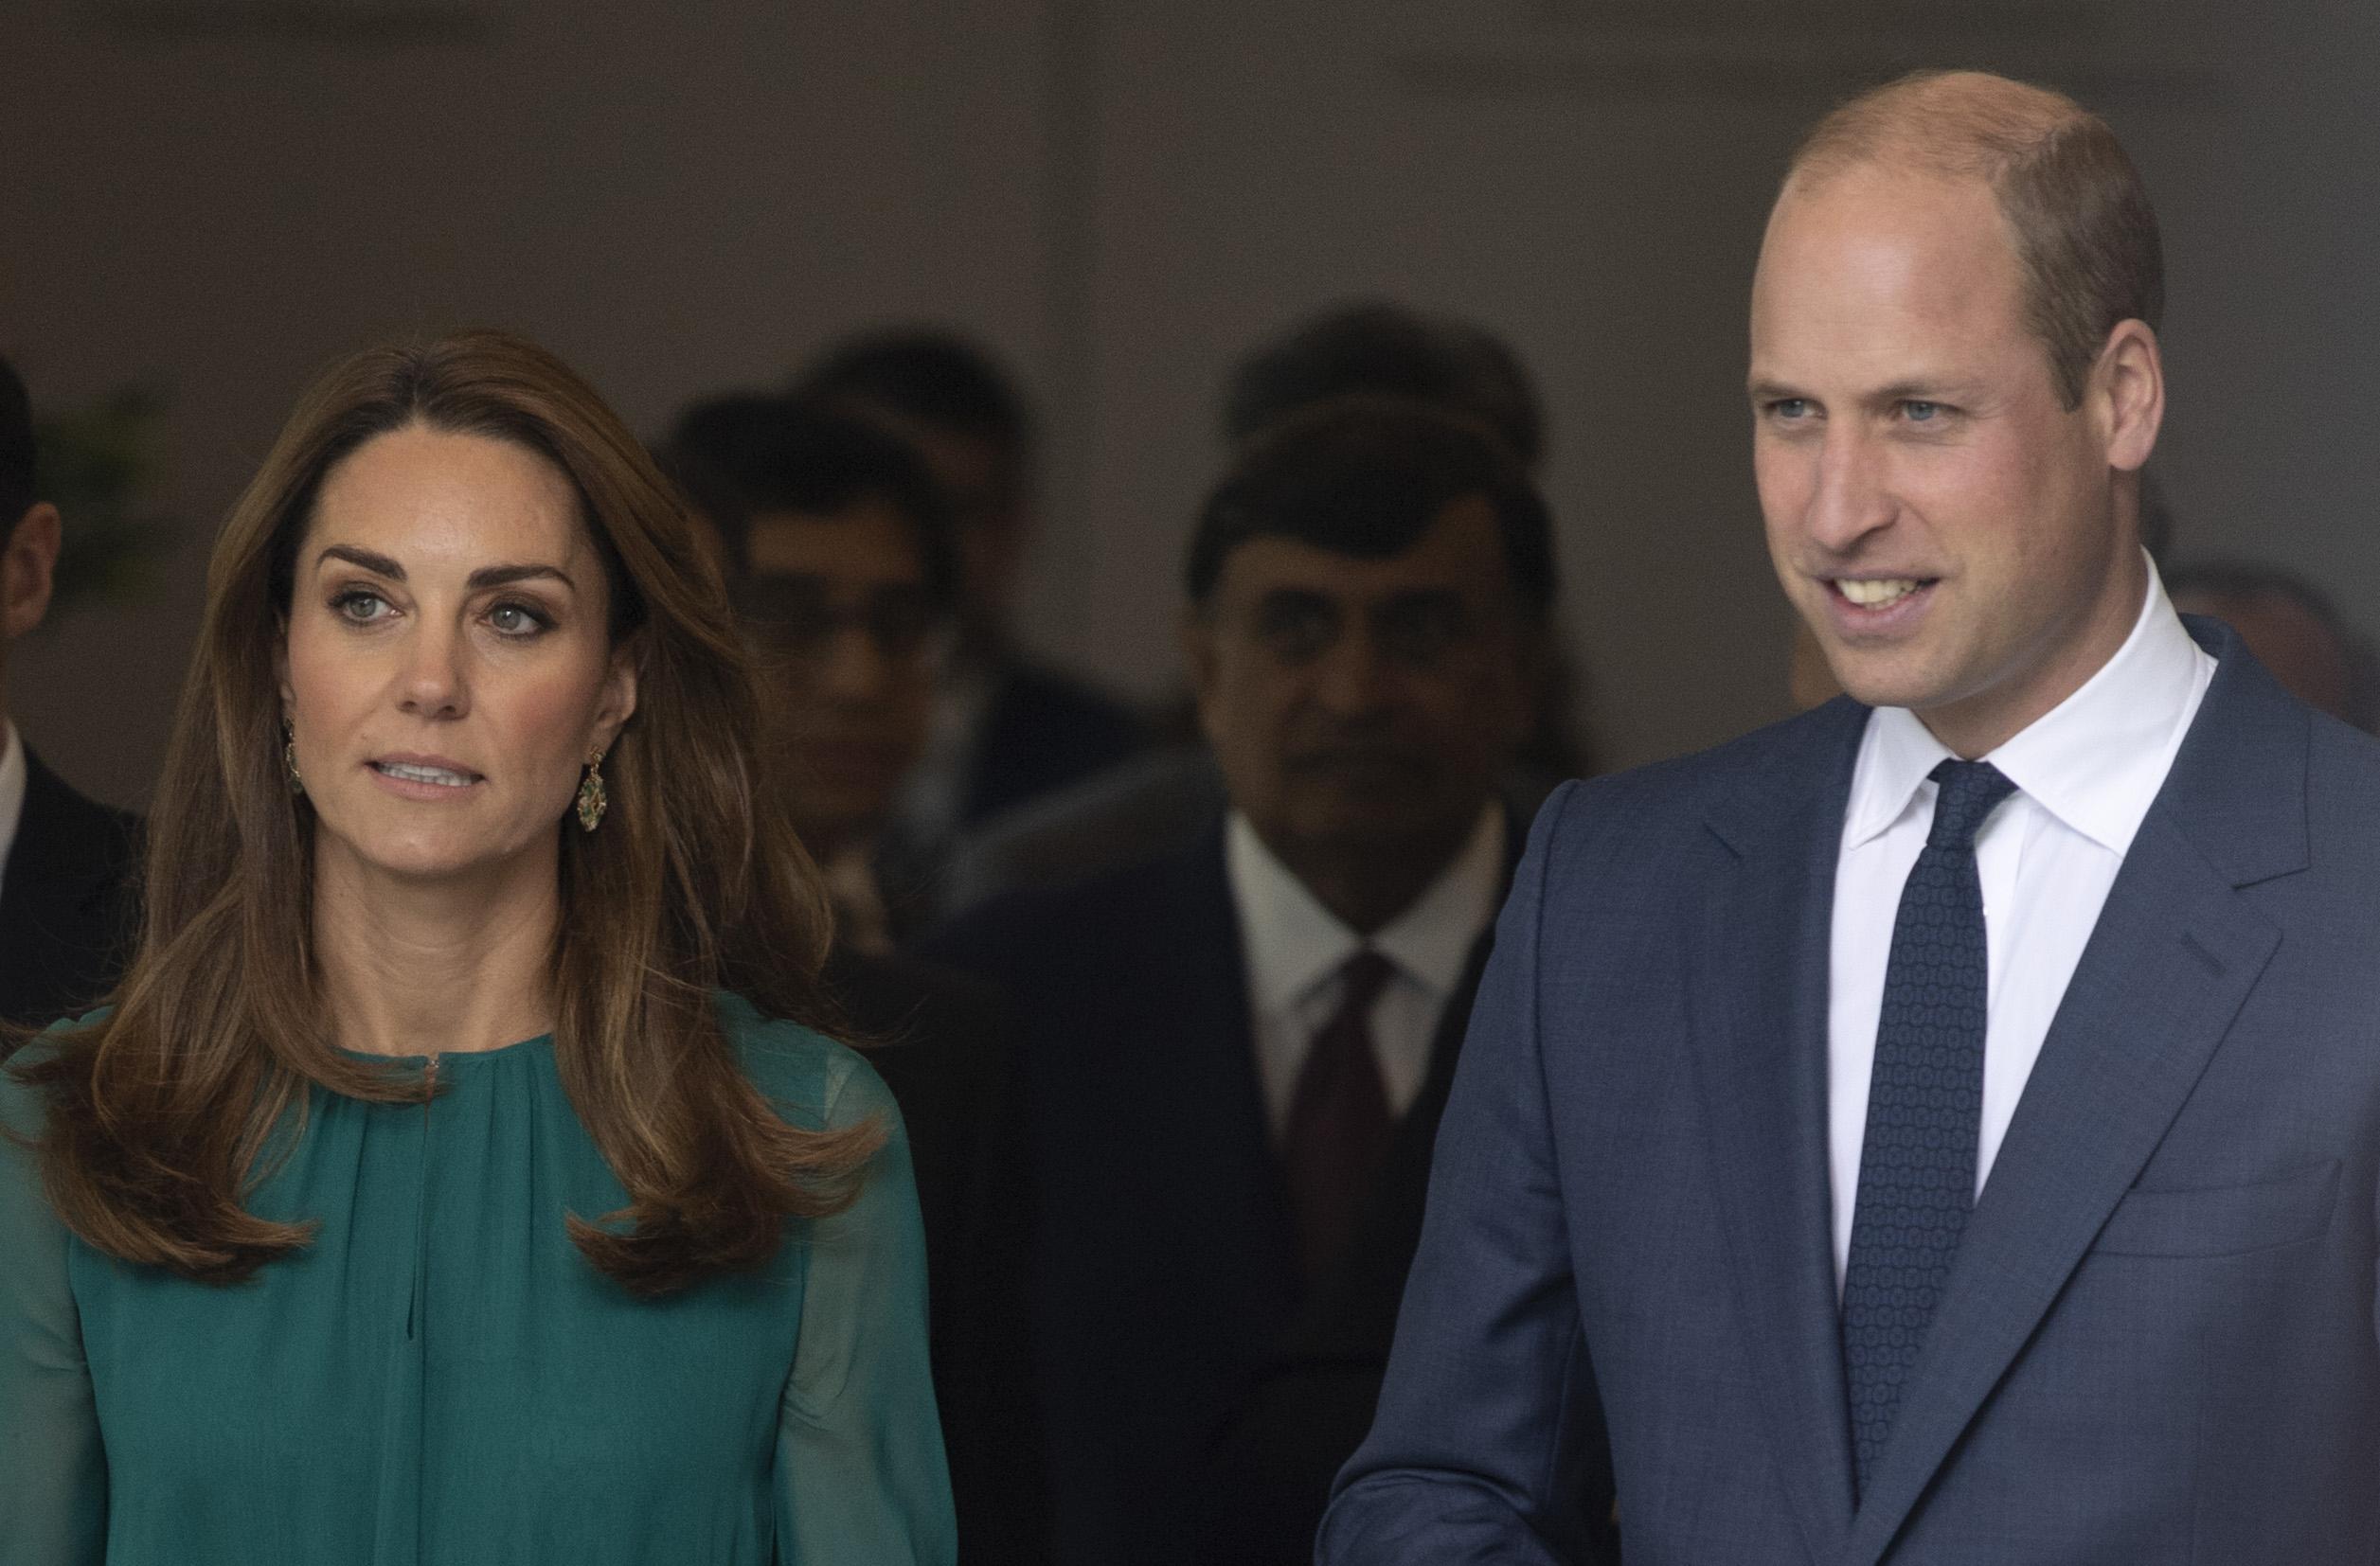 Kensington Palace reveals Duke and Duchess of Cambridge's Pakistan royal tour details are being kept secret over security concerns